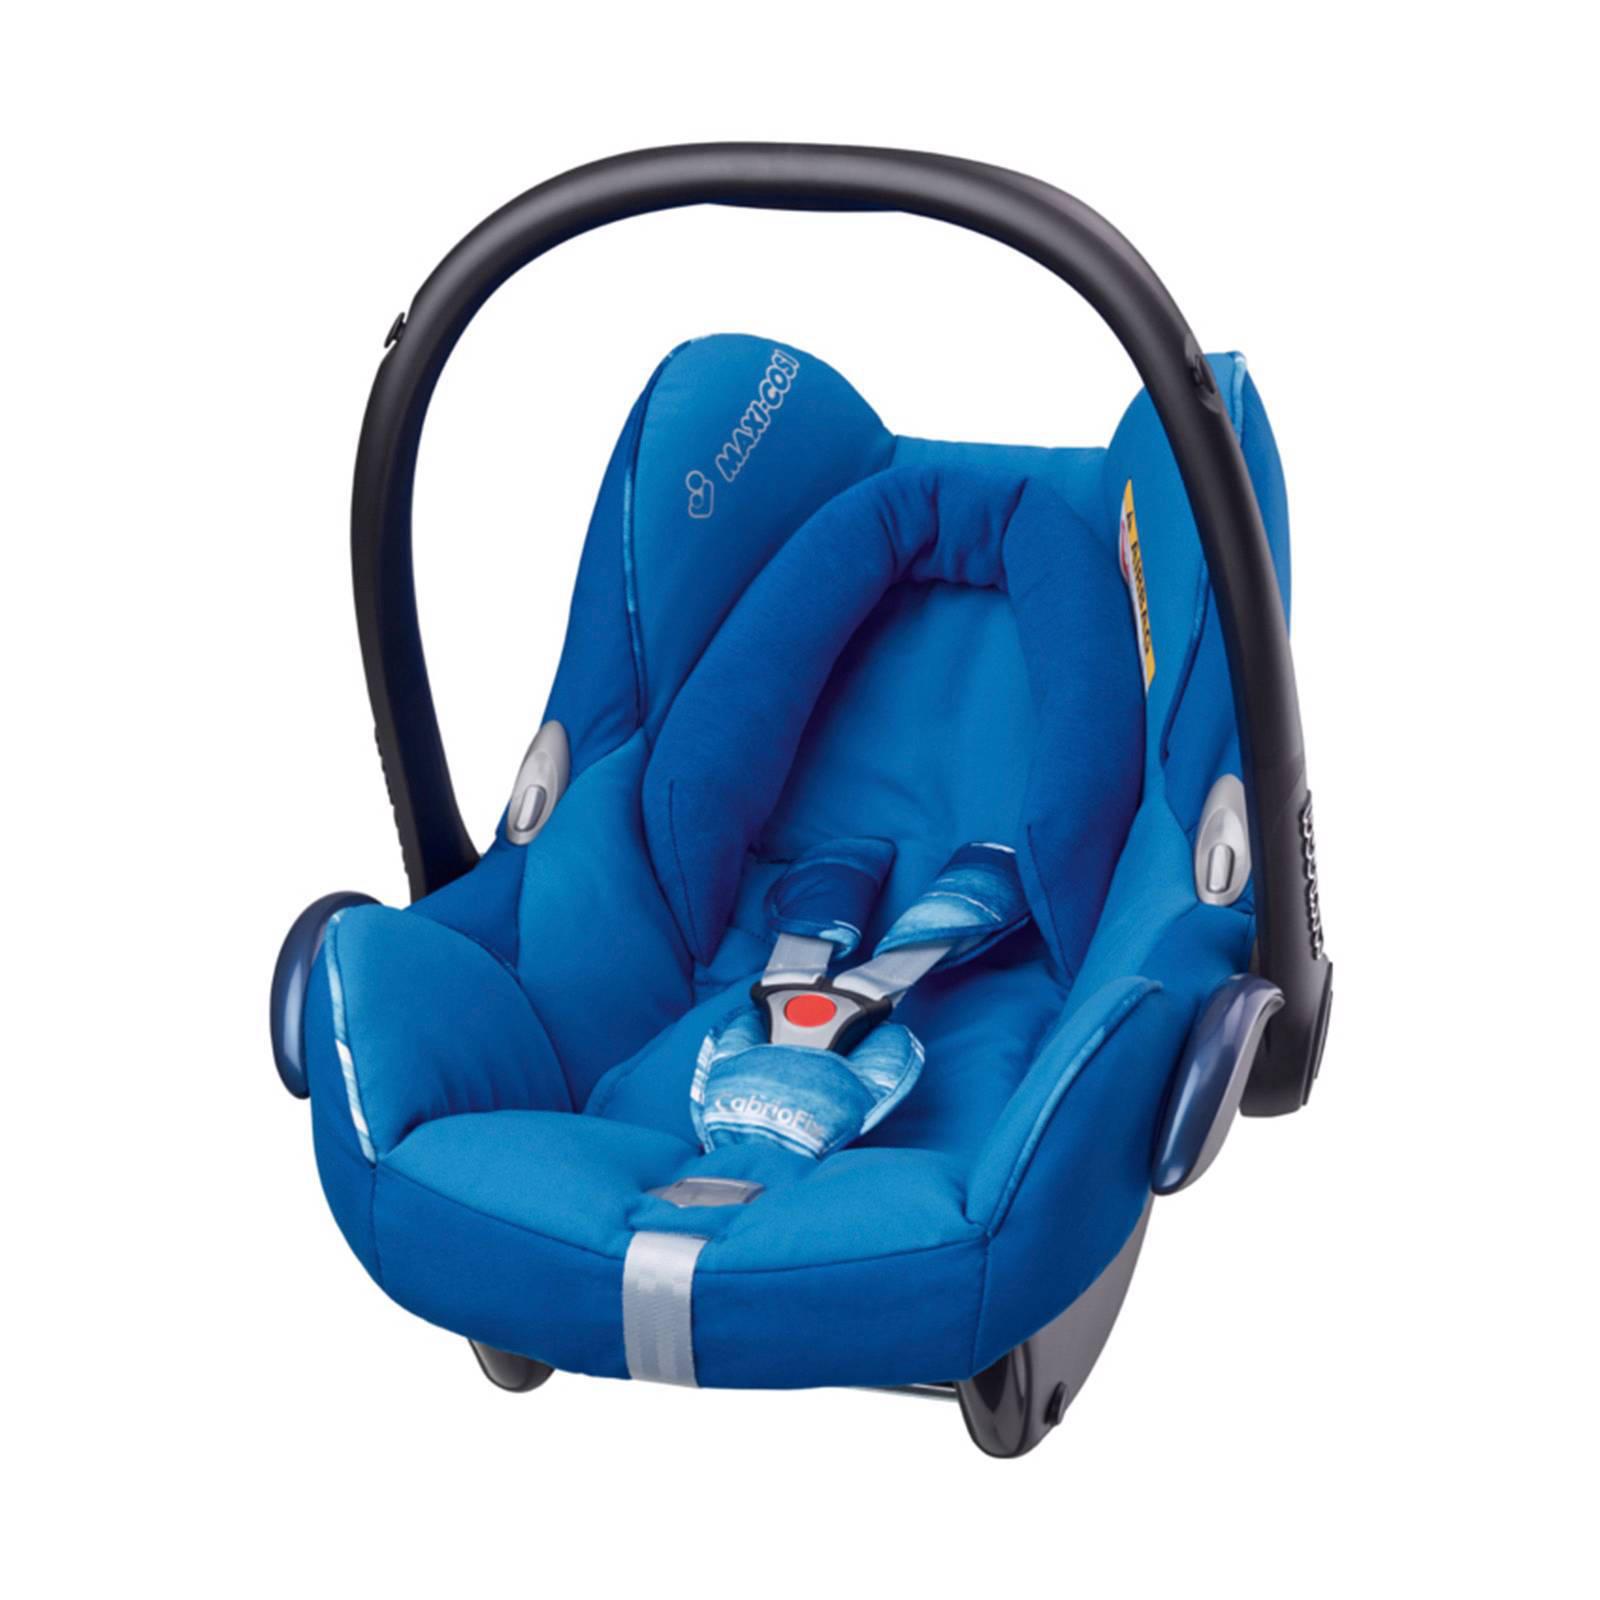 Maxi-Cosi CabrioFix autostoel groep 0+ watercolor blue